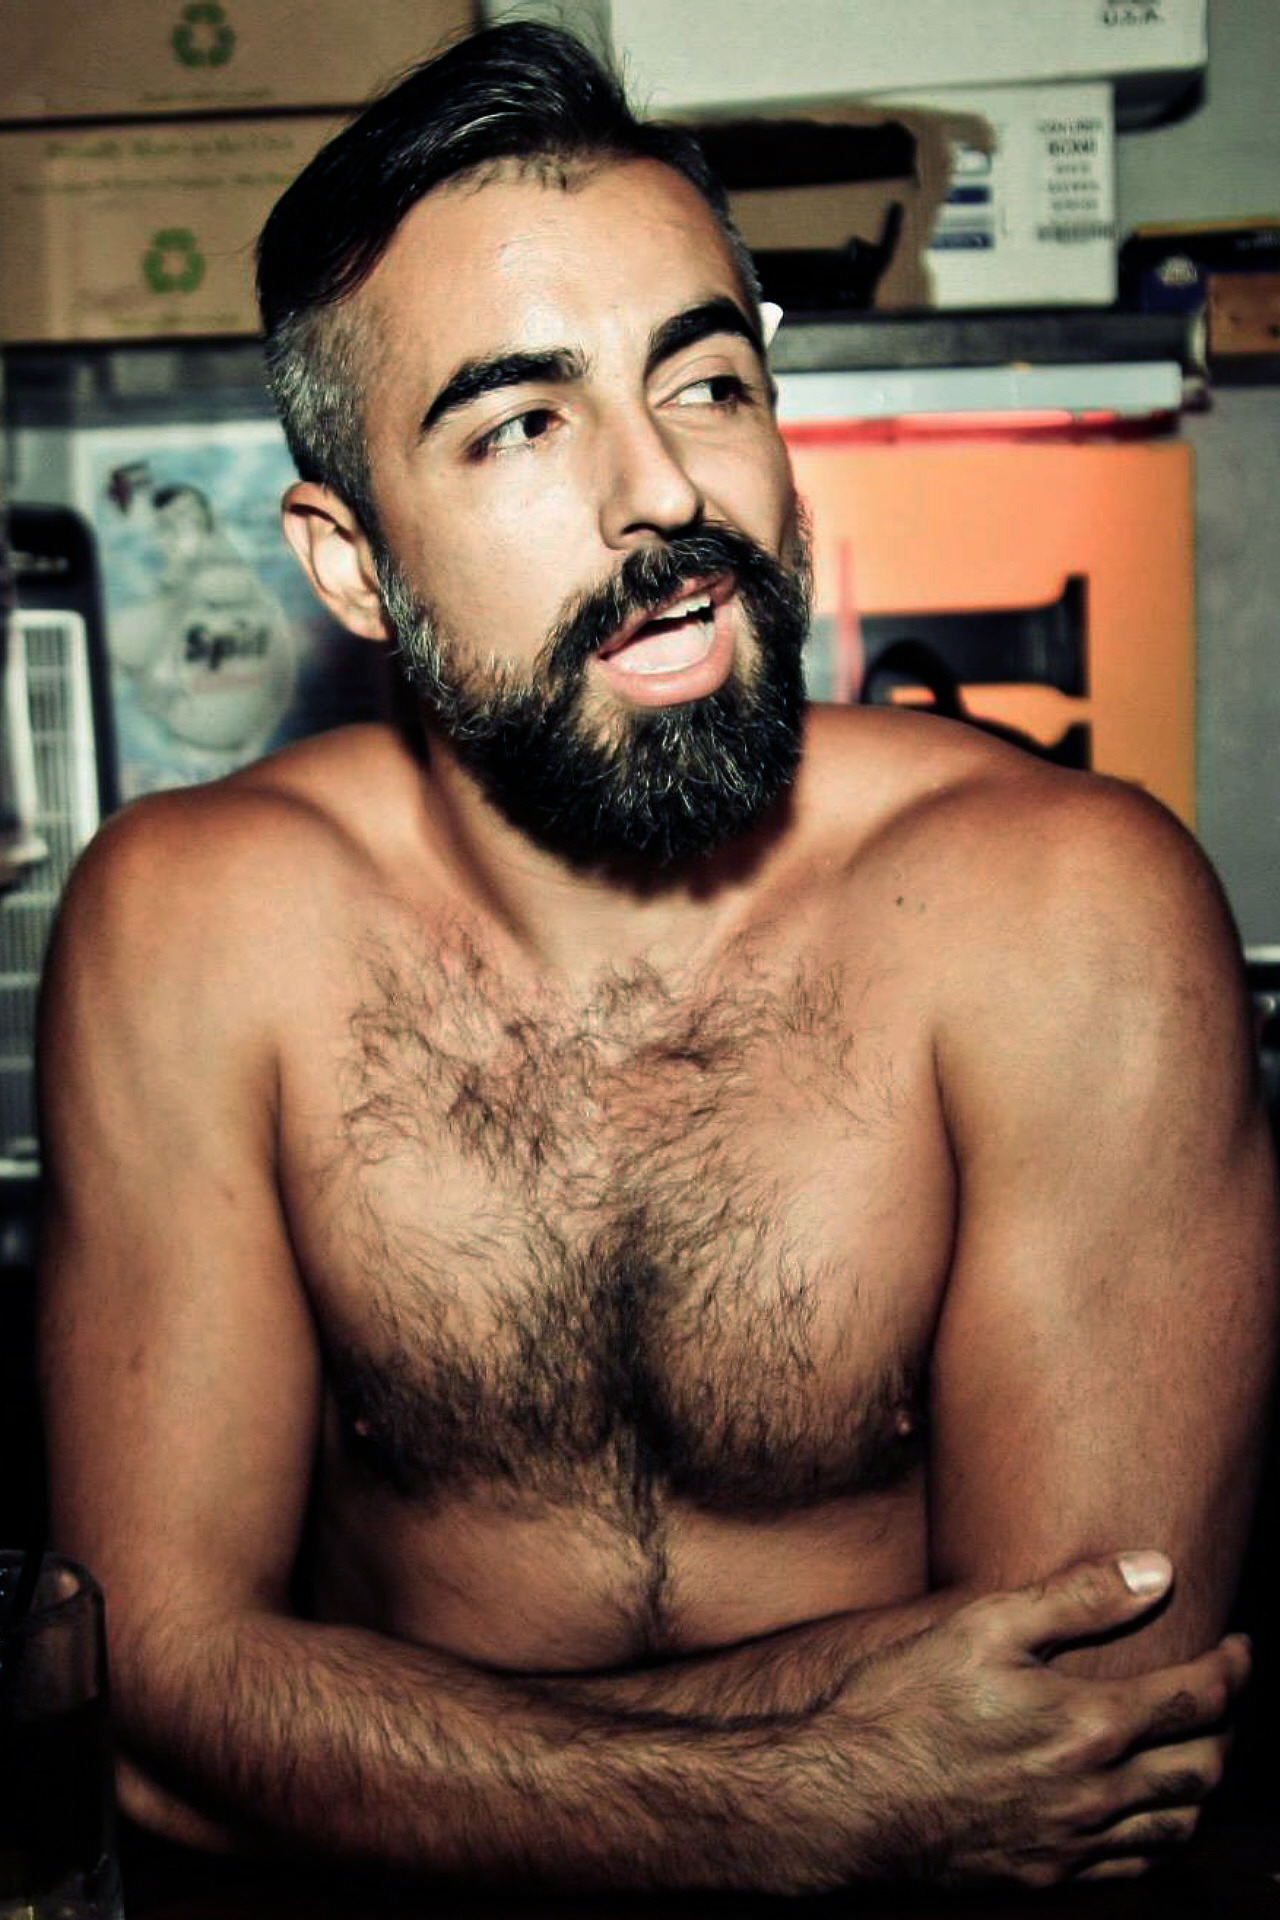 2018-06-04 05:23:23 - manly vigour robert craig welch beardburnme http://www.neofic.com